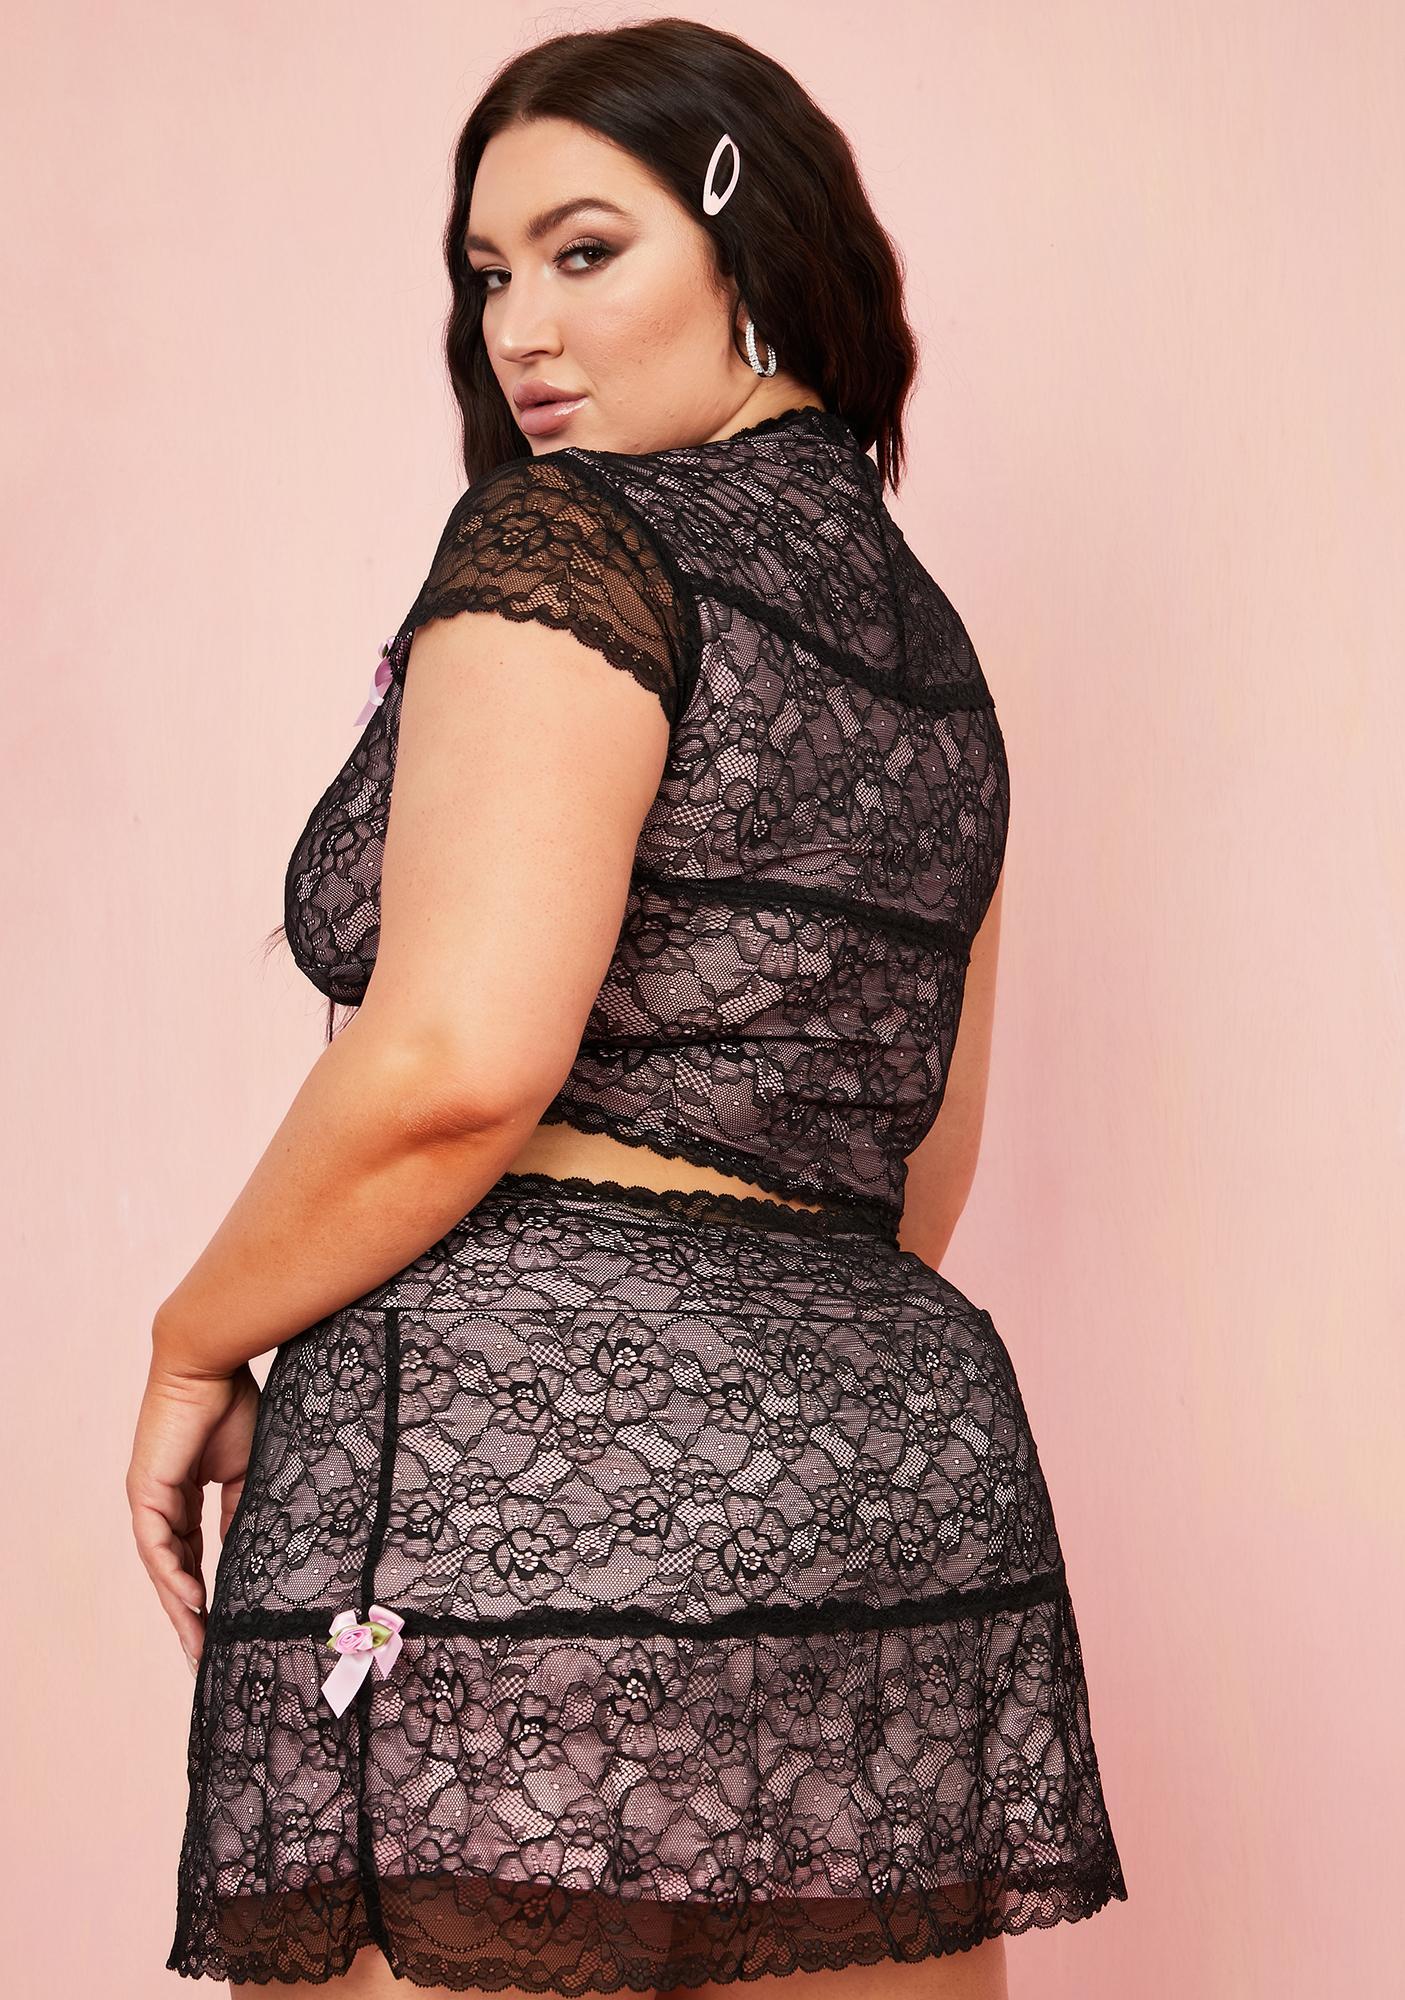 Sugar Thrillz In Portrait Mode Lace Mini Skirt